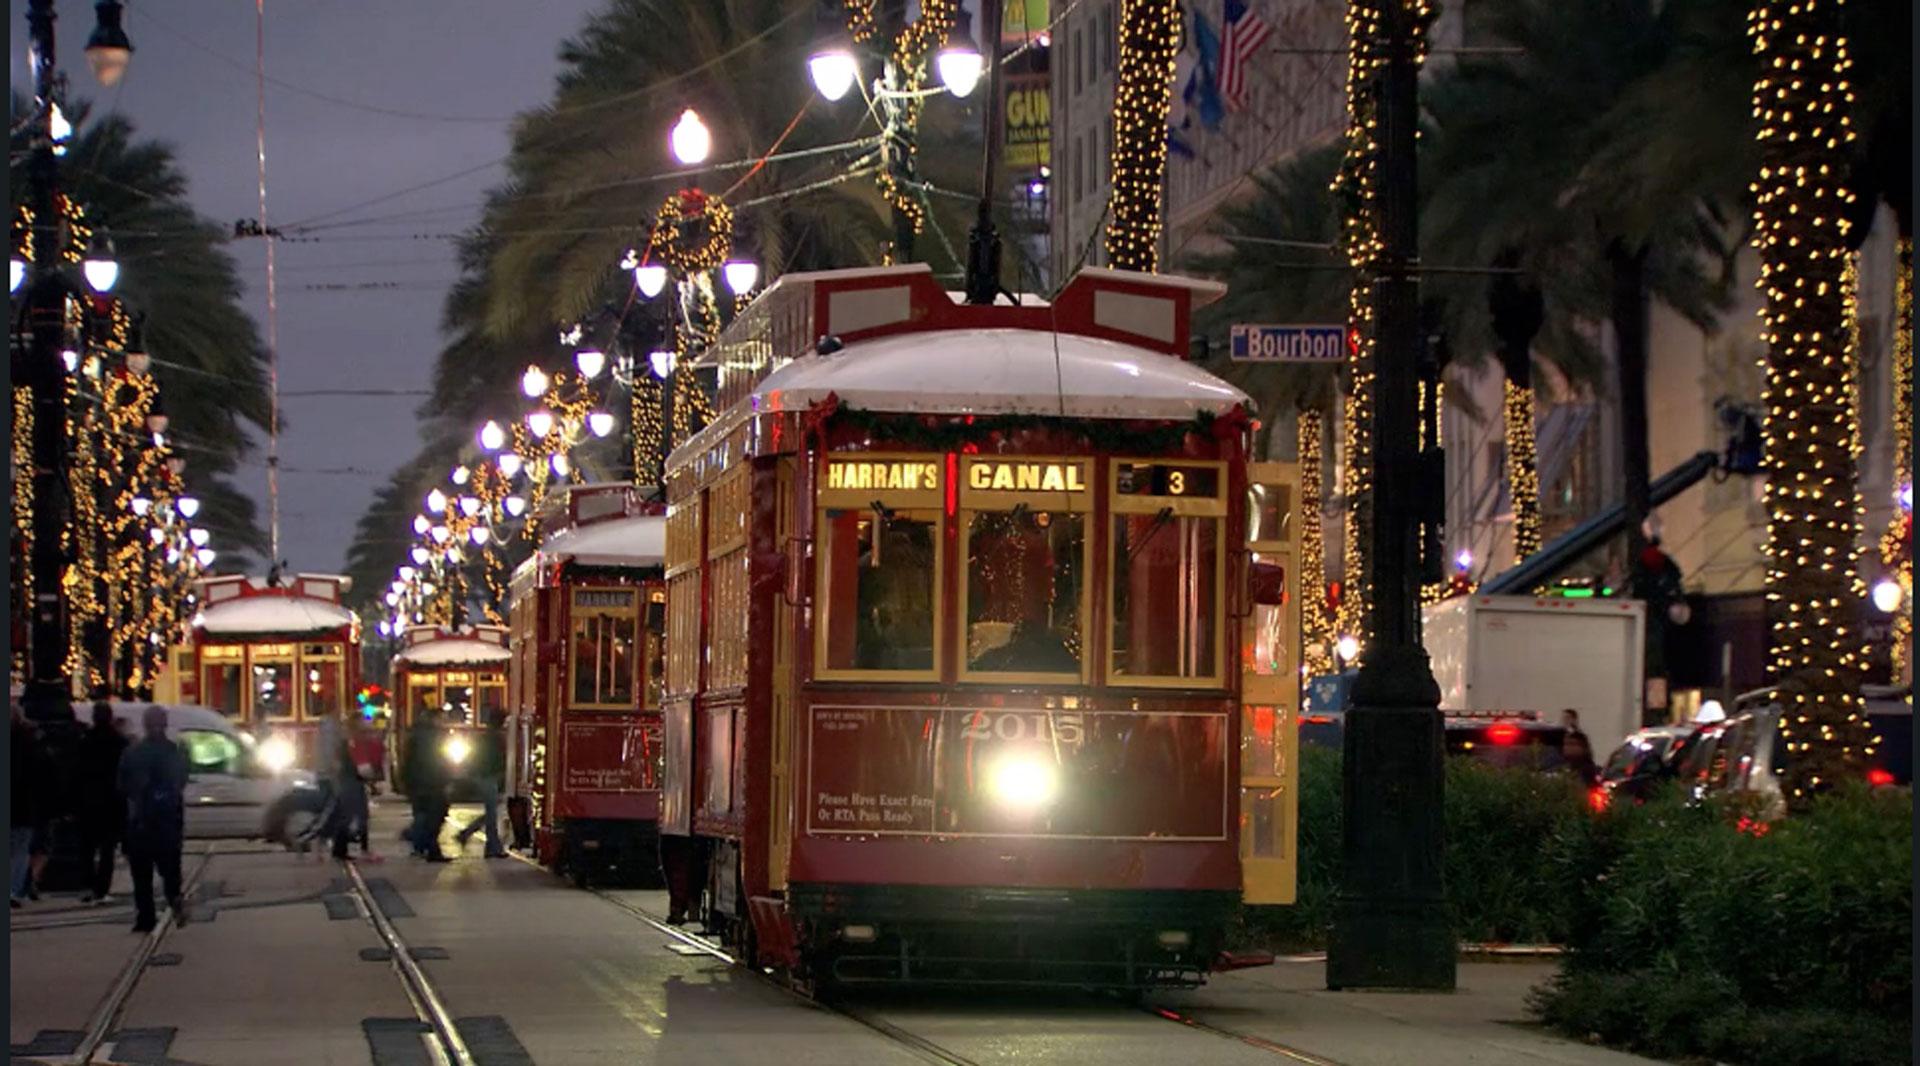 Lights in the Park. Photo courtesy of Louisiana Public Broadcasting.